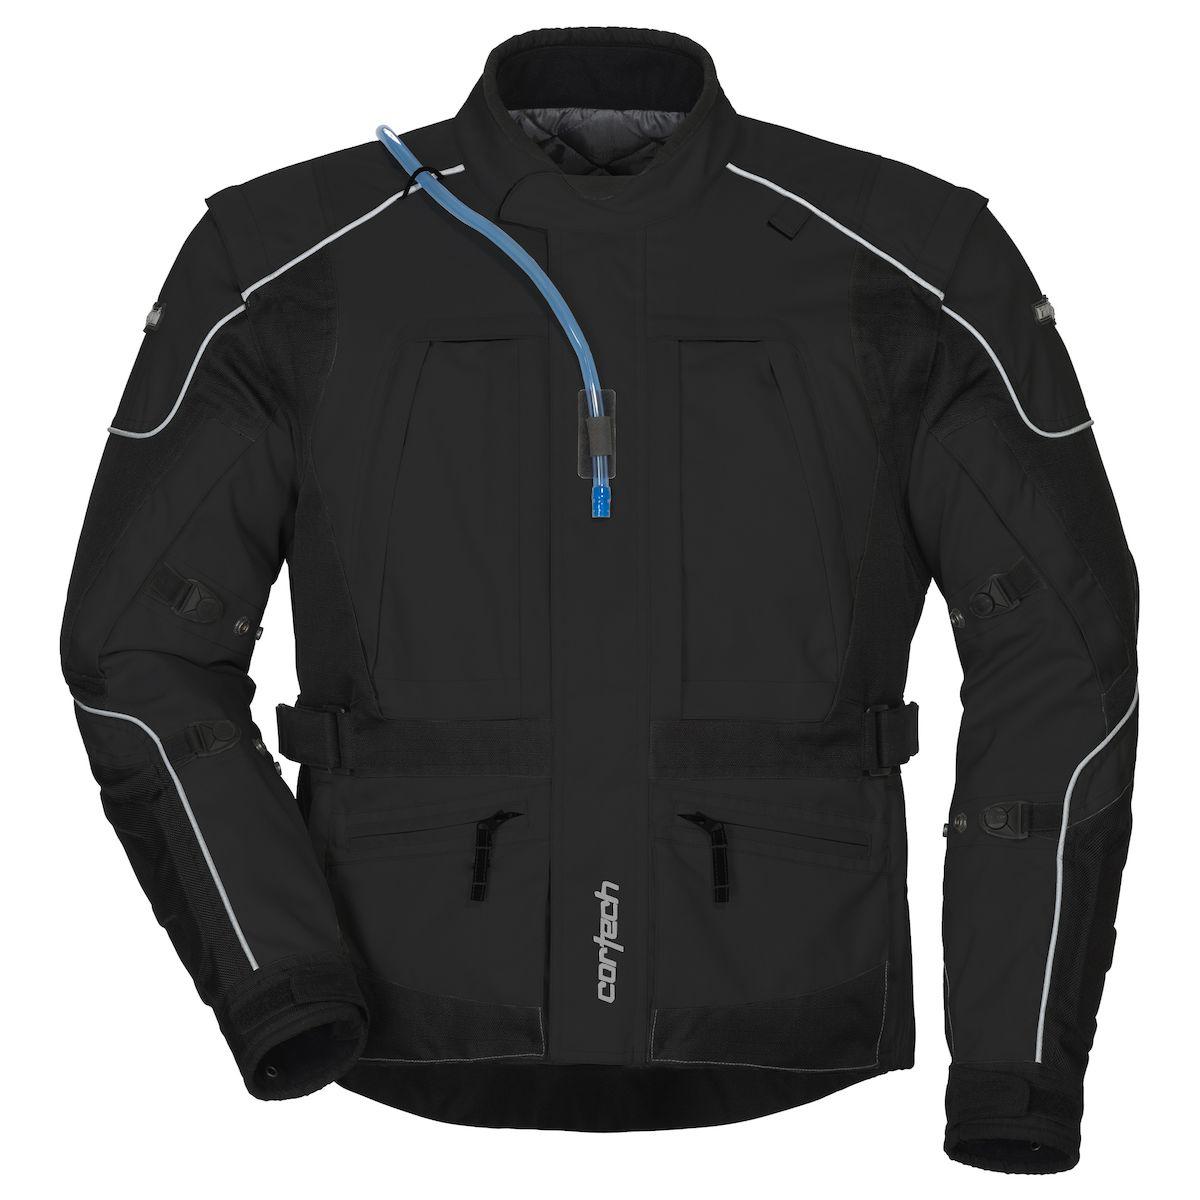 Cortech Sequoia XC Mens Adventure Touring Jacket Black